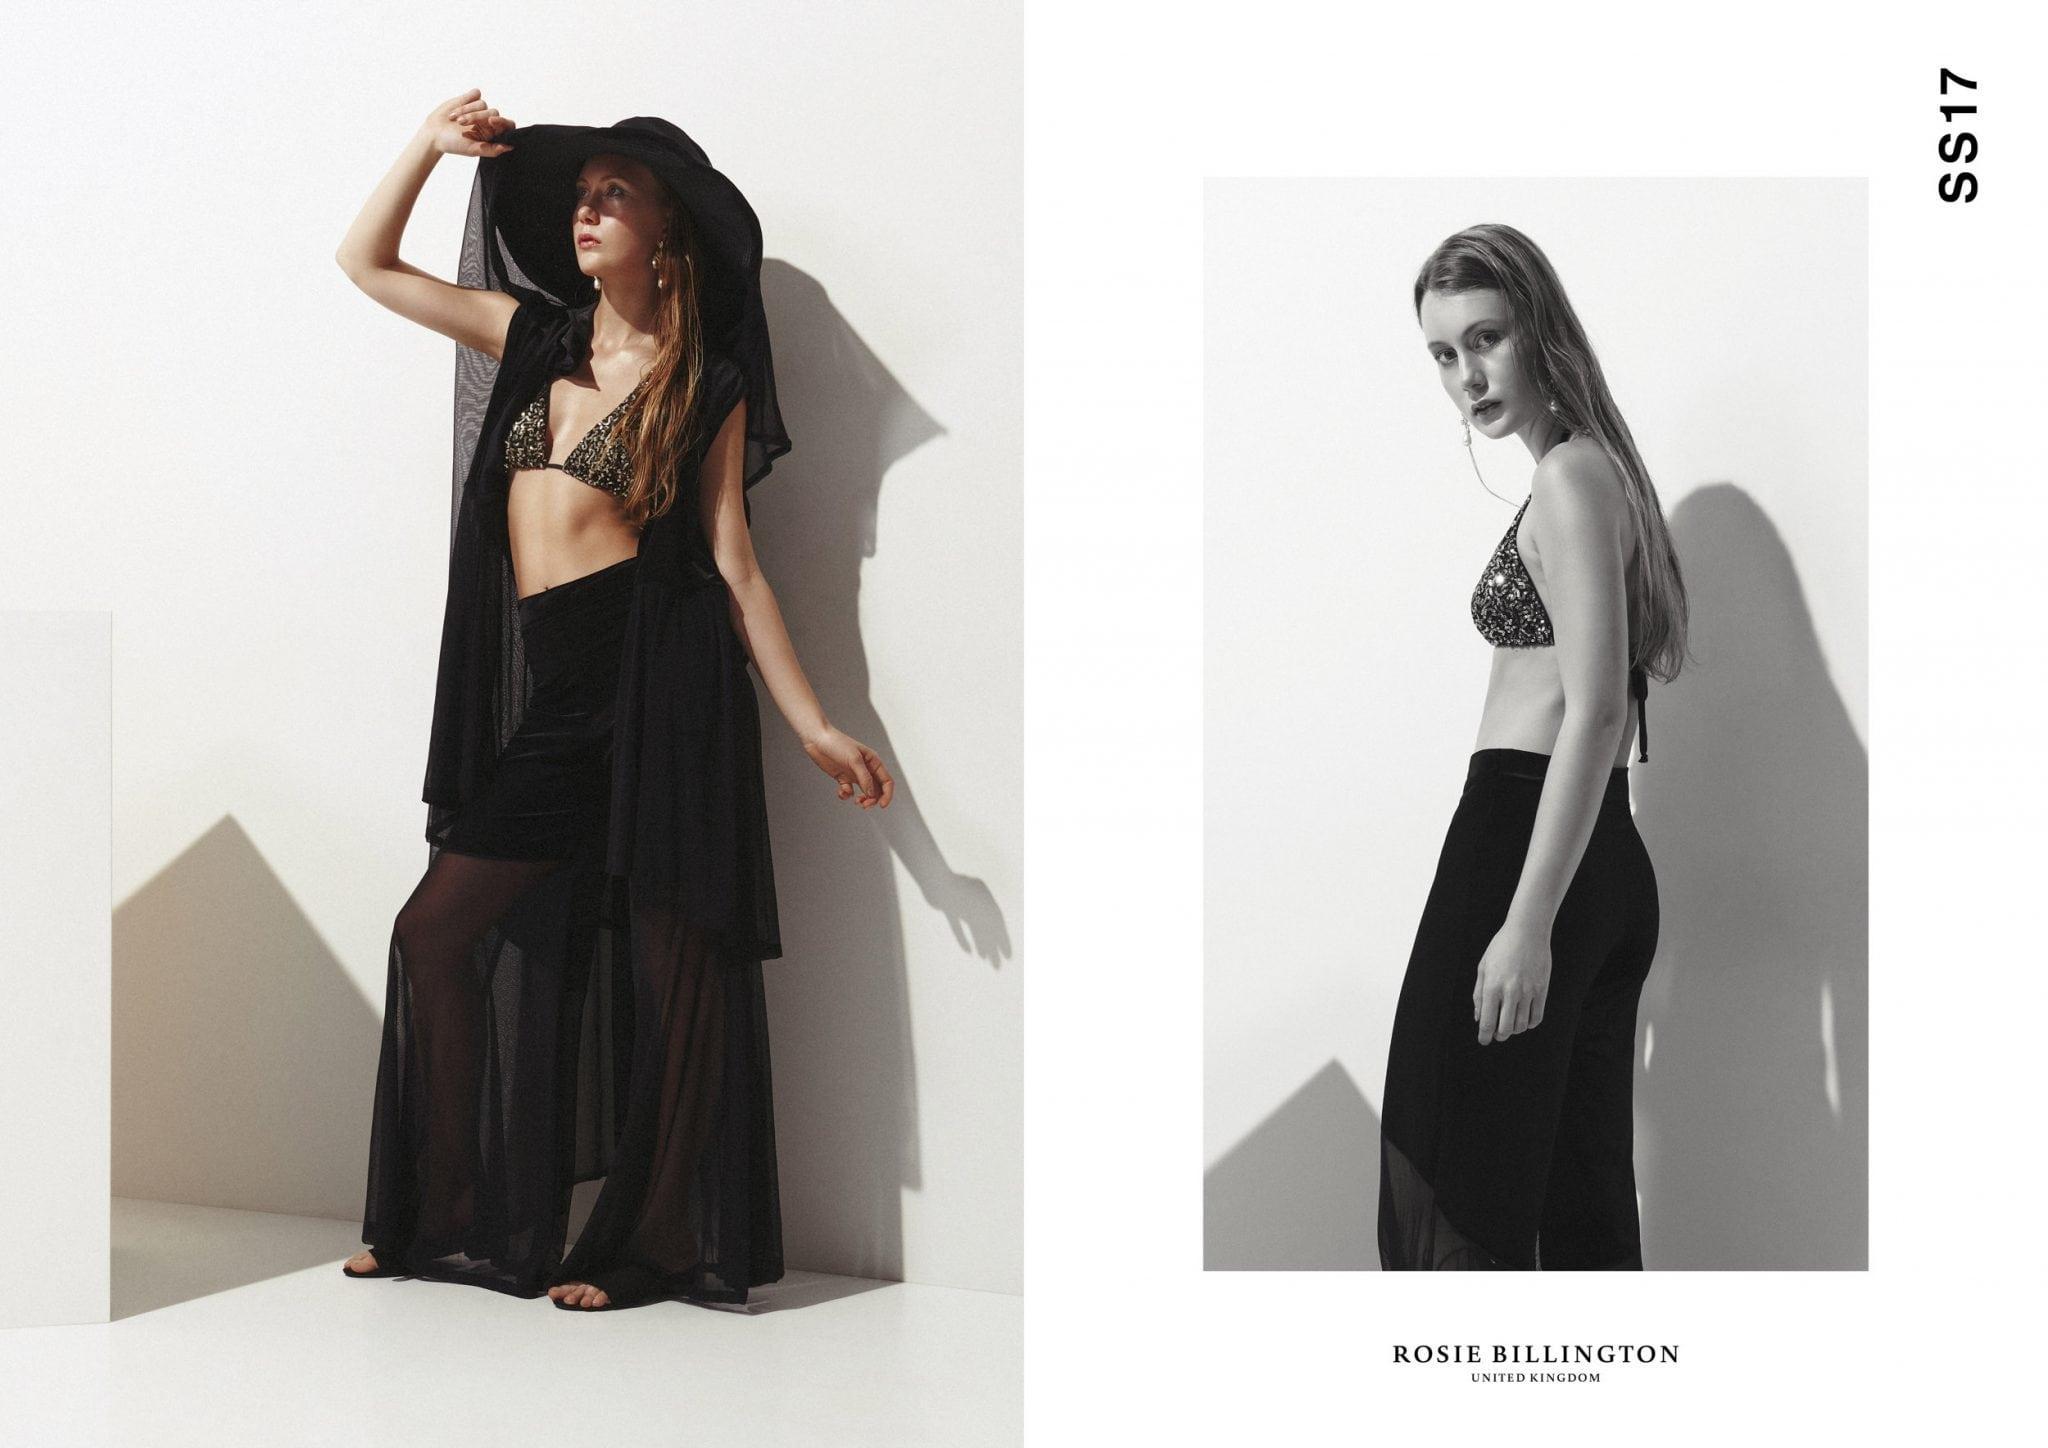 saint loupe, digital agency birmingham, creative studio uk, content production, web agency, marketing agency birmingham, fashion photography